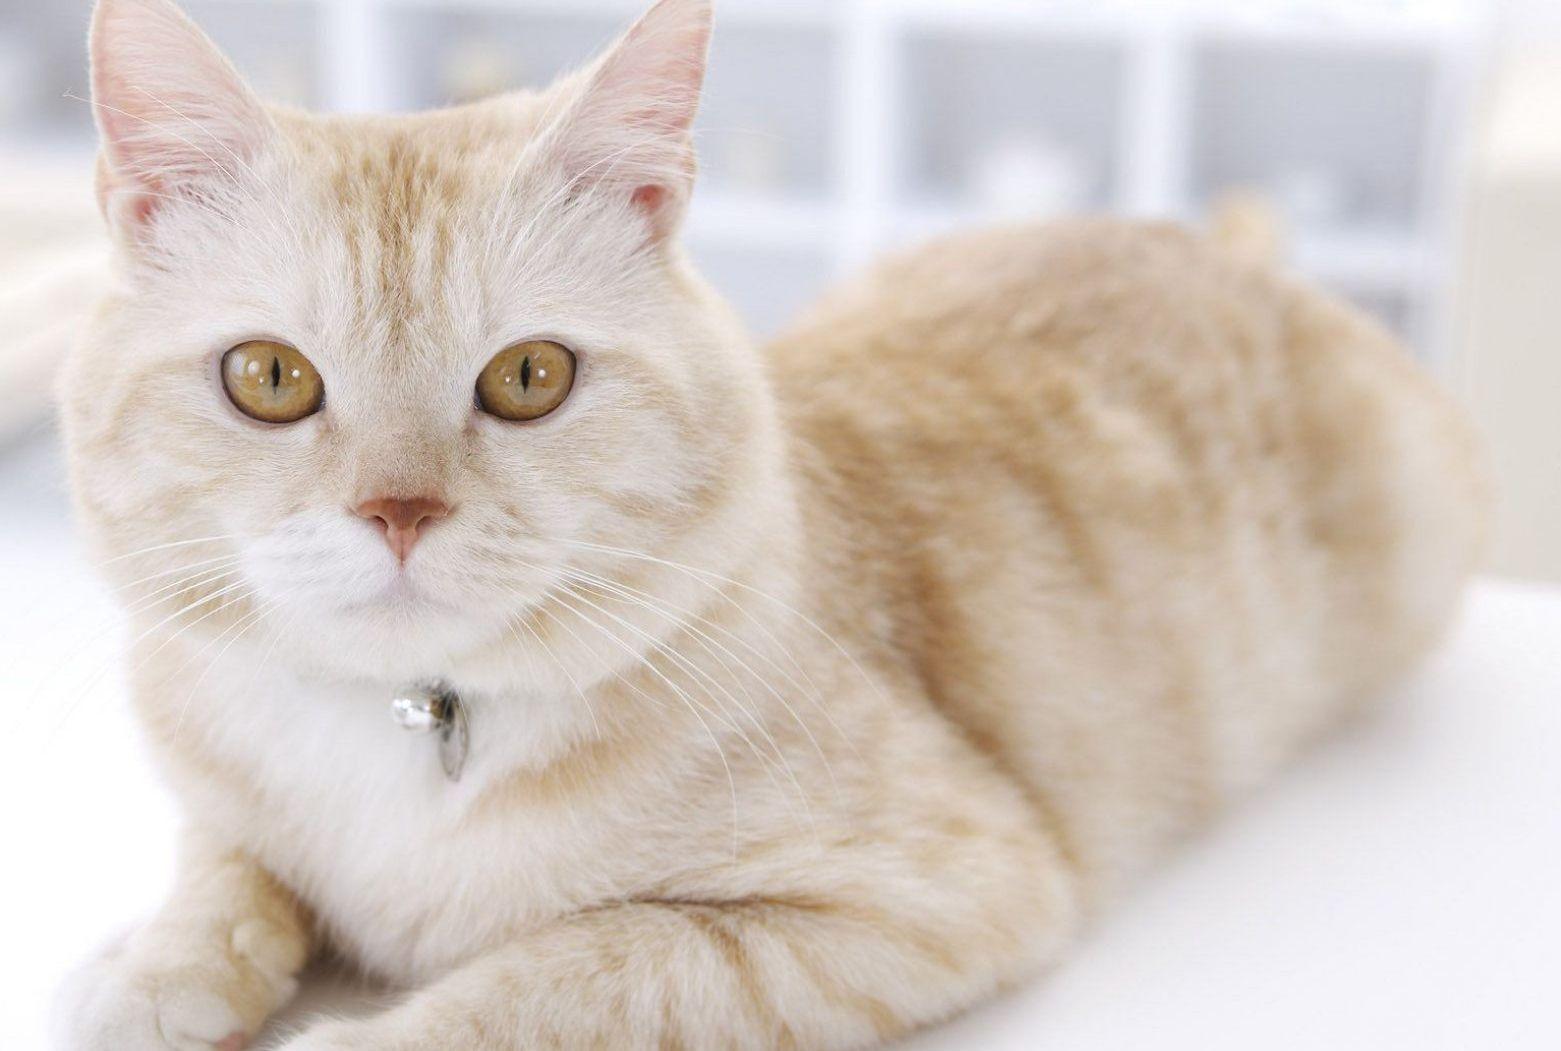 средства по уходу за кошками